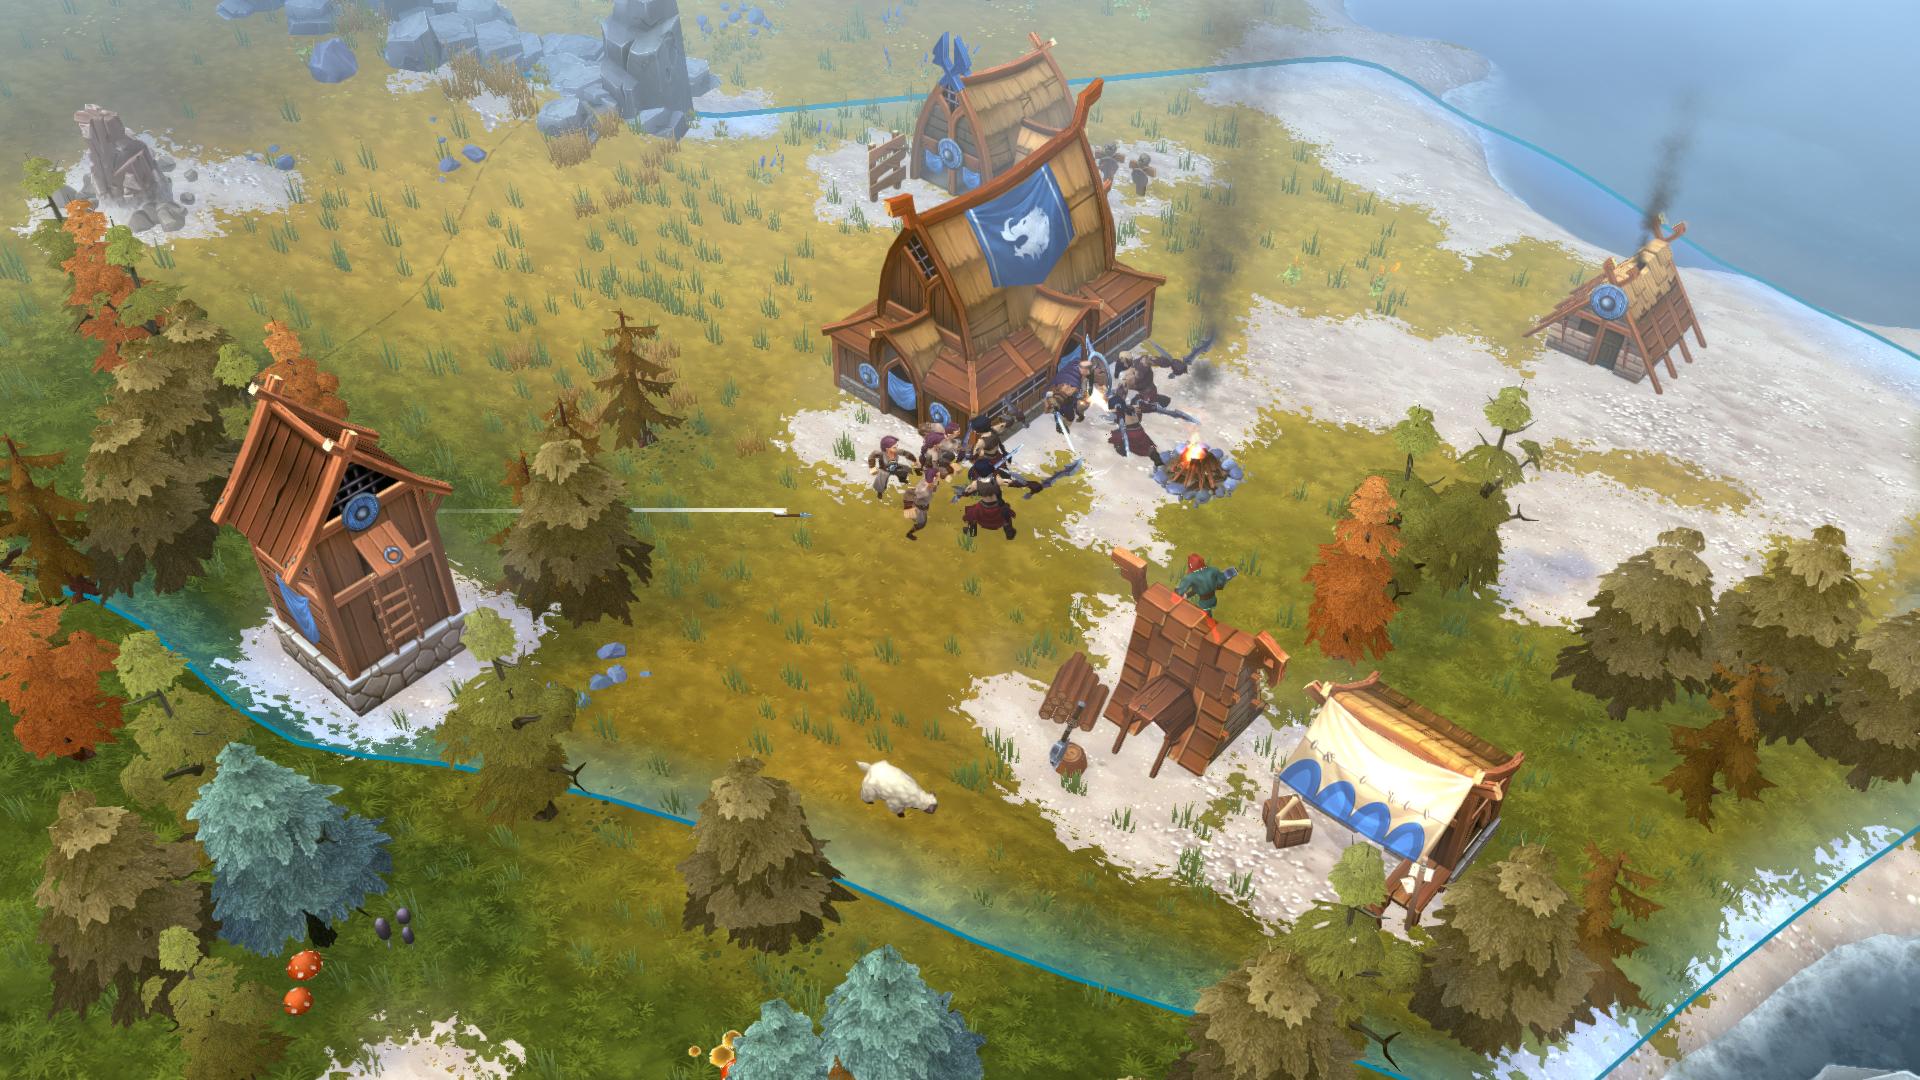 Northgard - Nidhogg, Clan of the Dragon screenshot